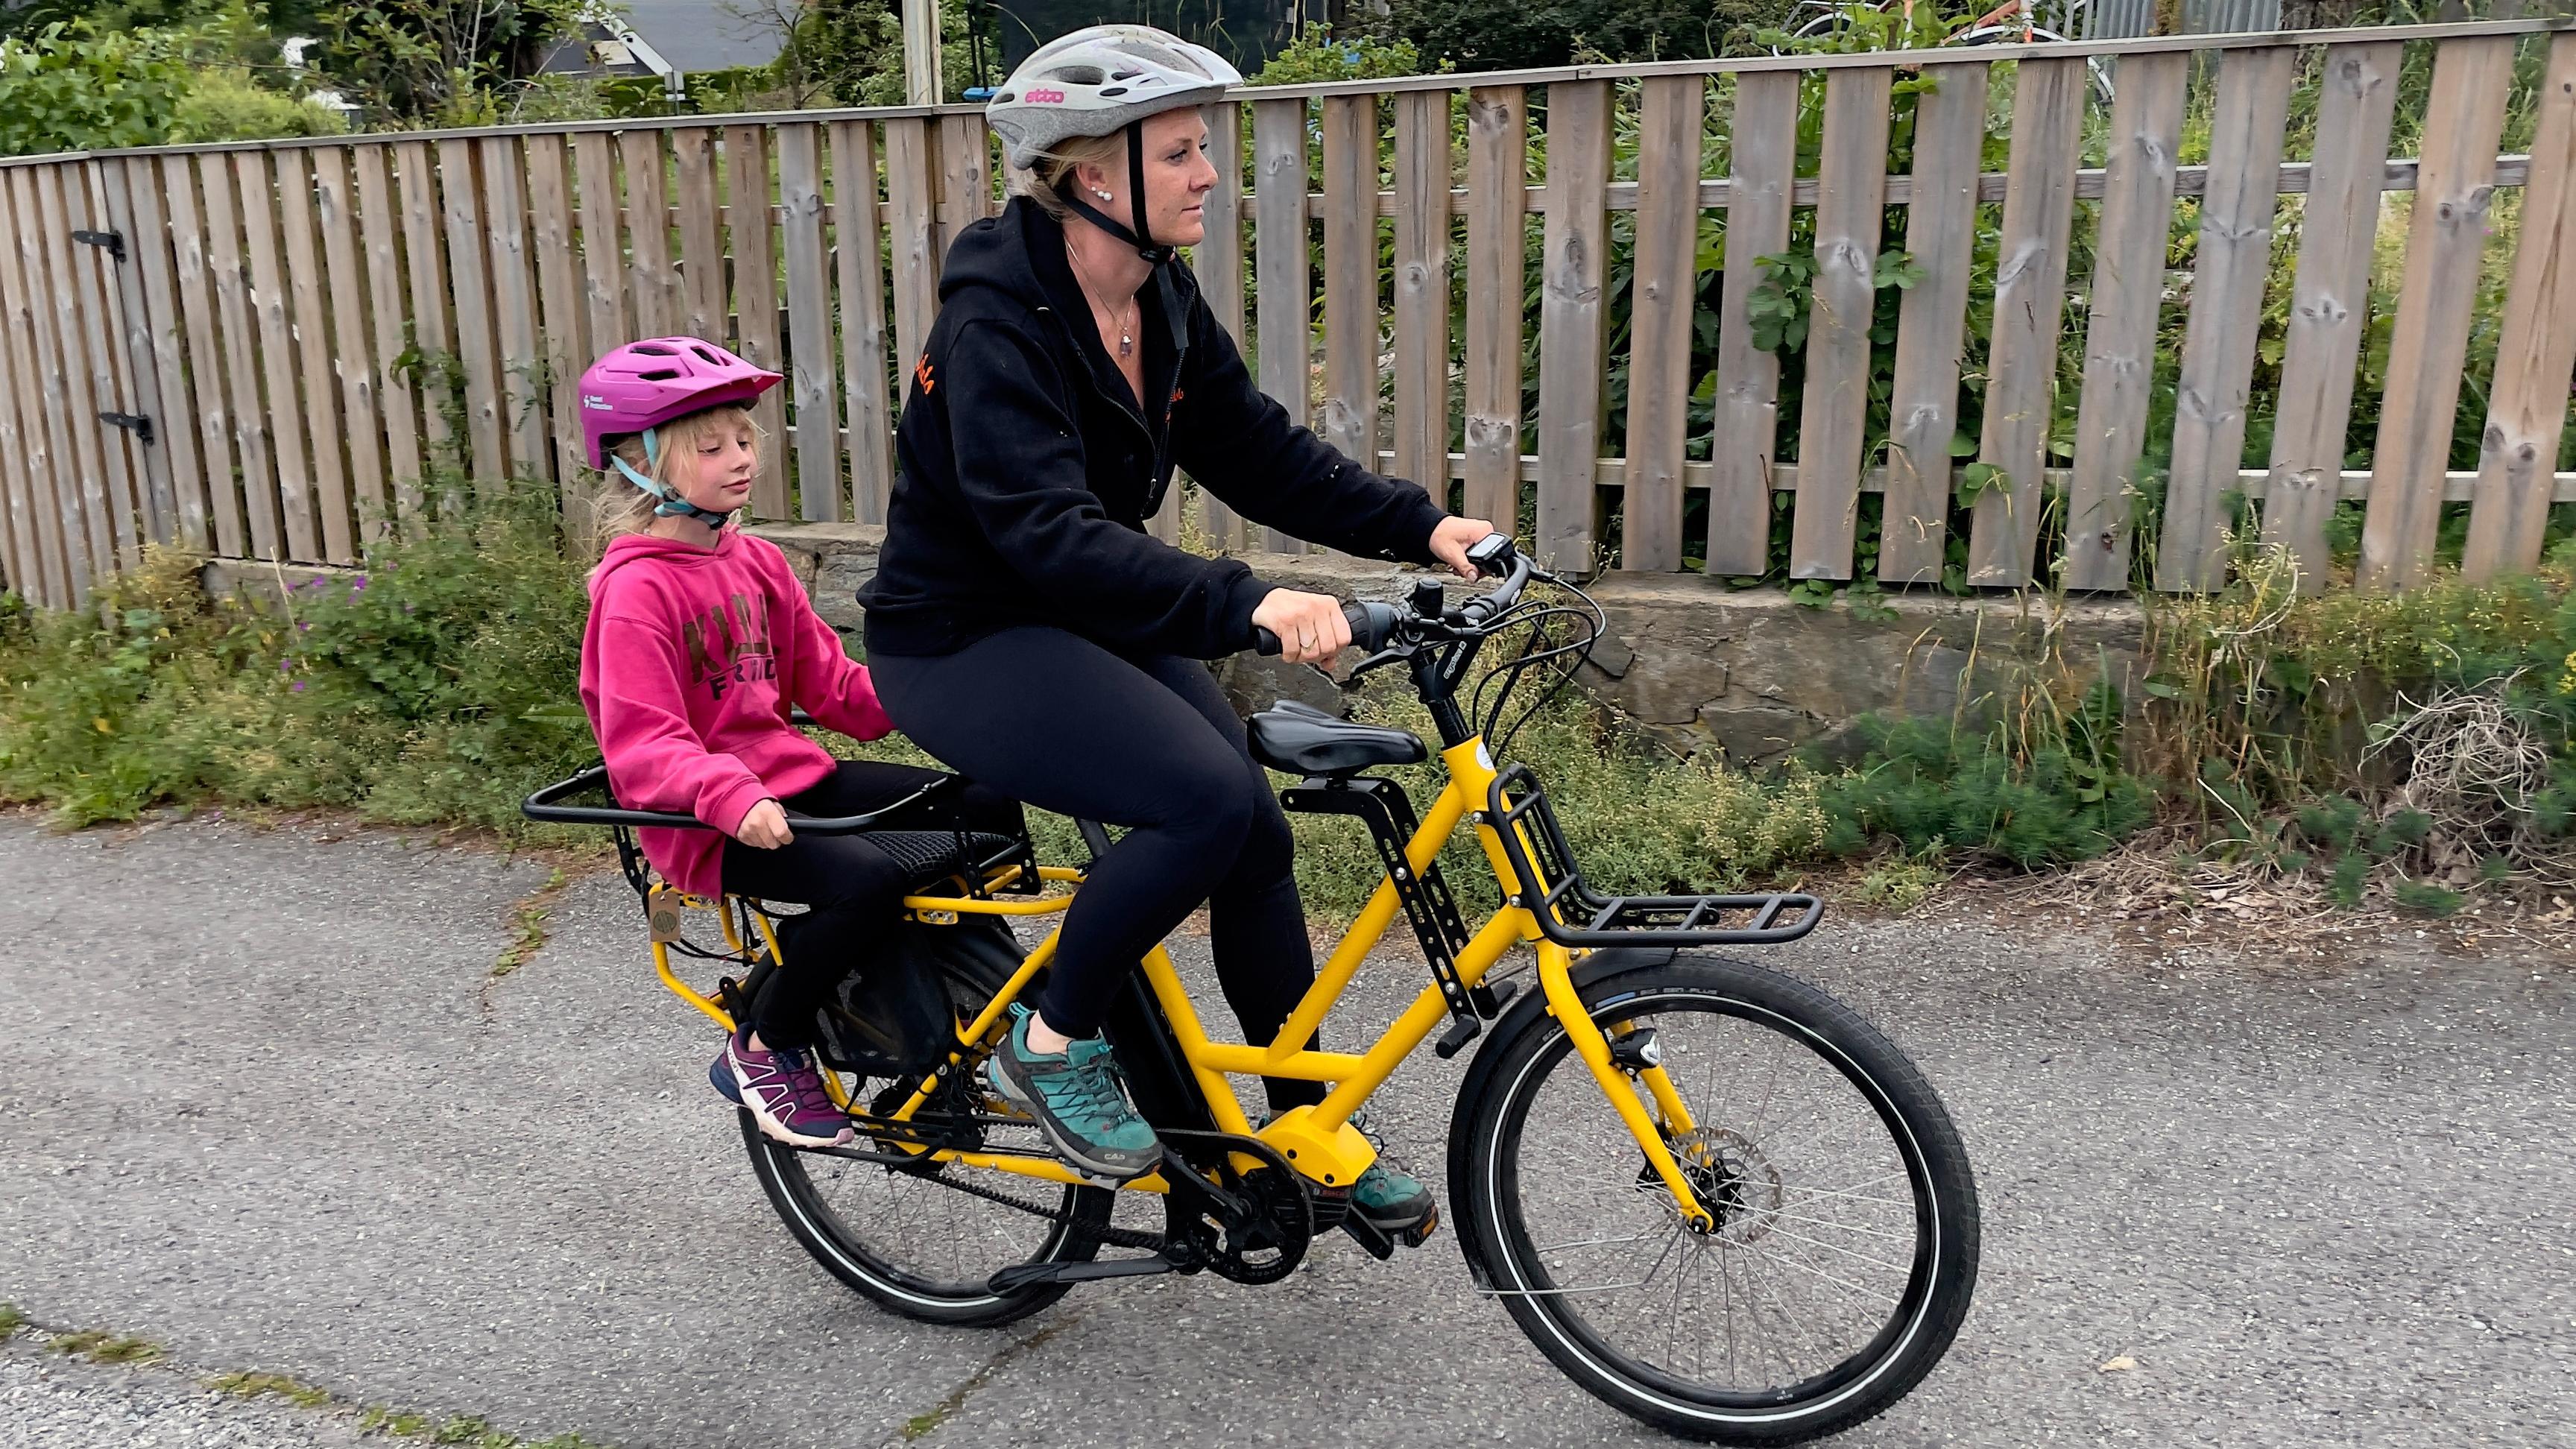 Kompakt og praktisk el-lastesykkel